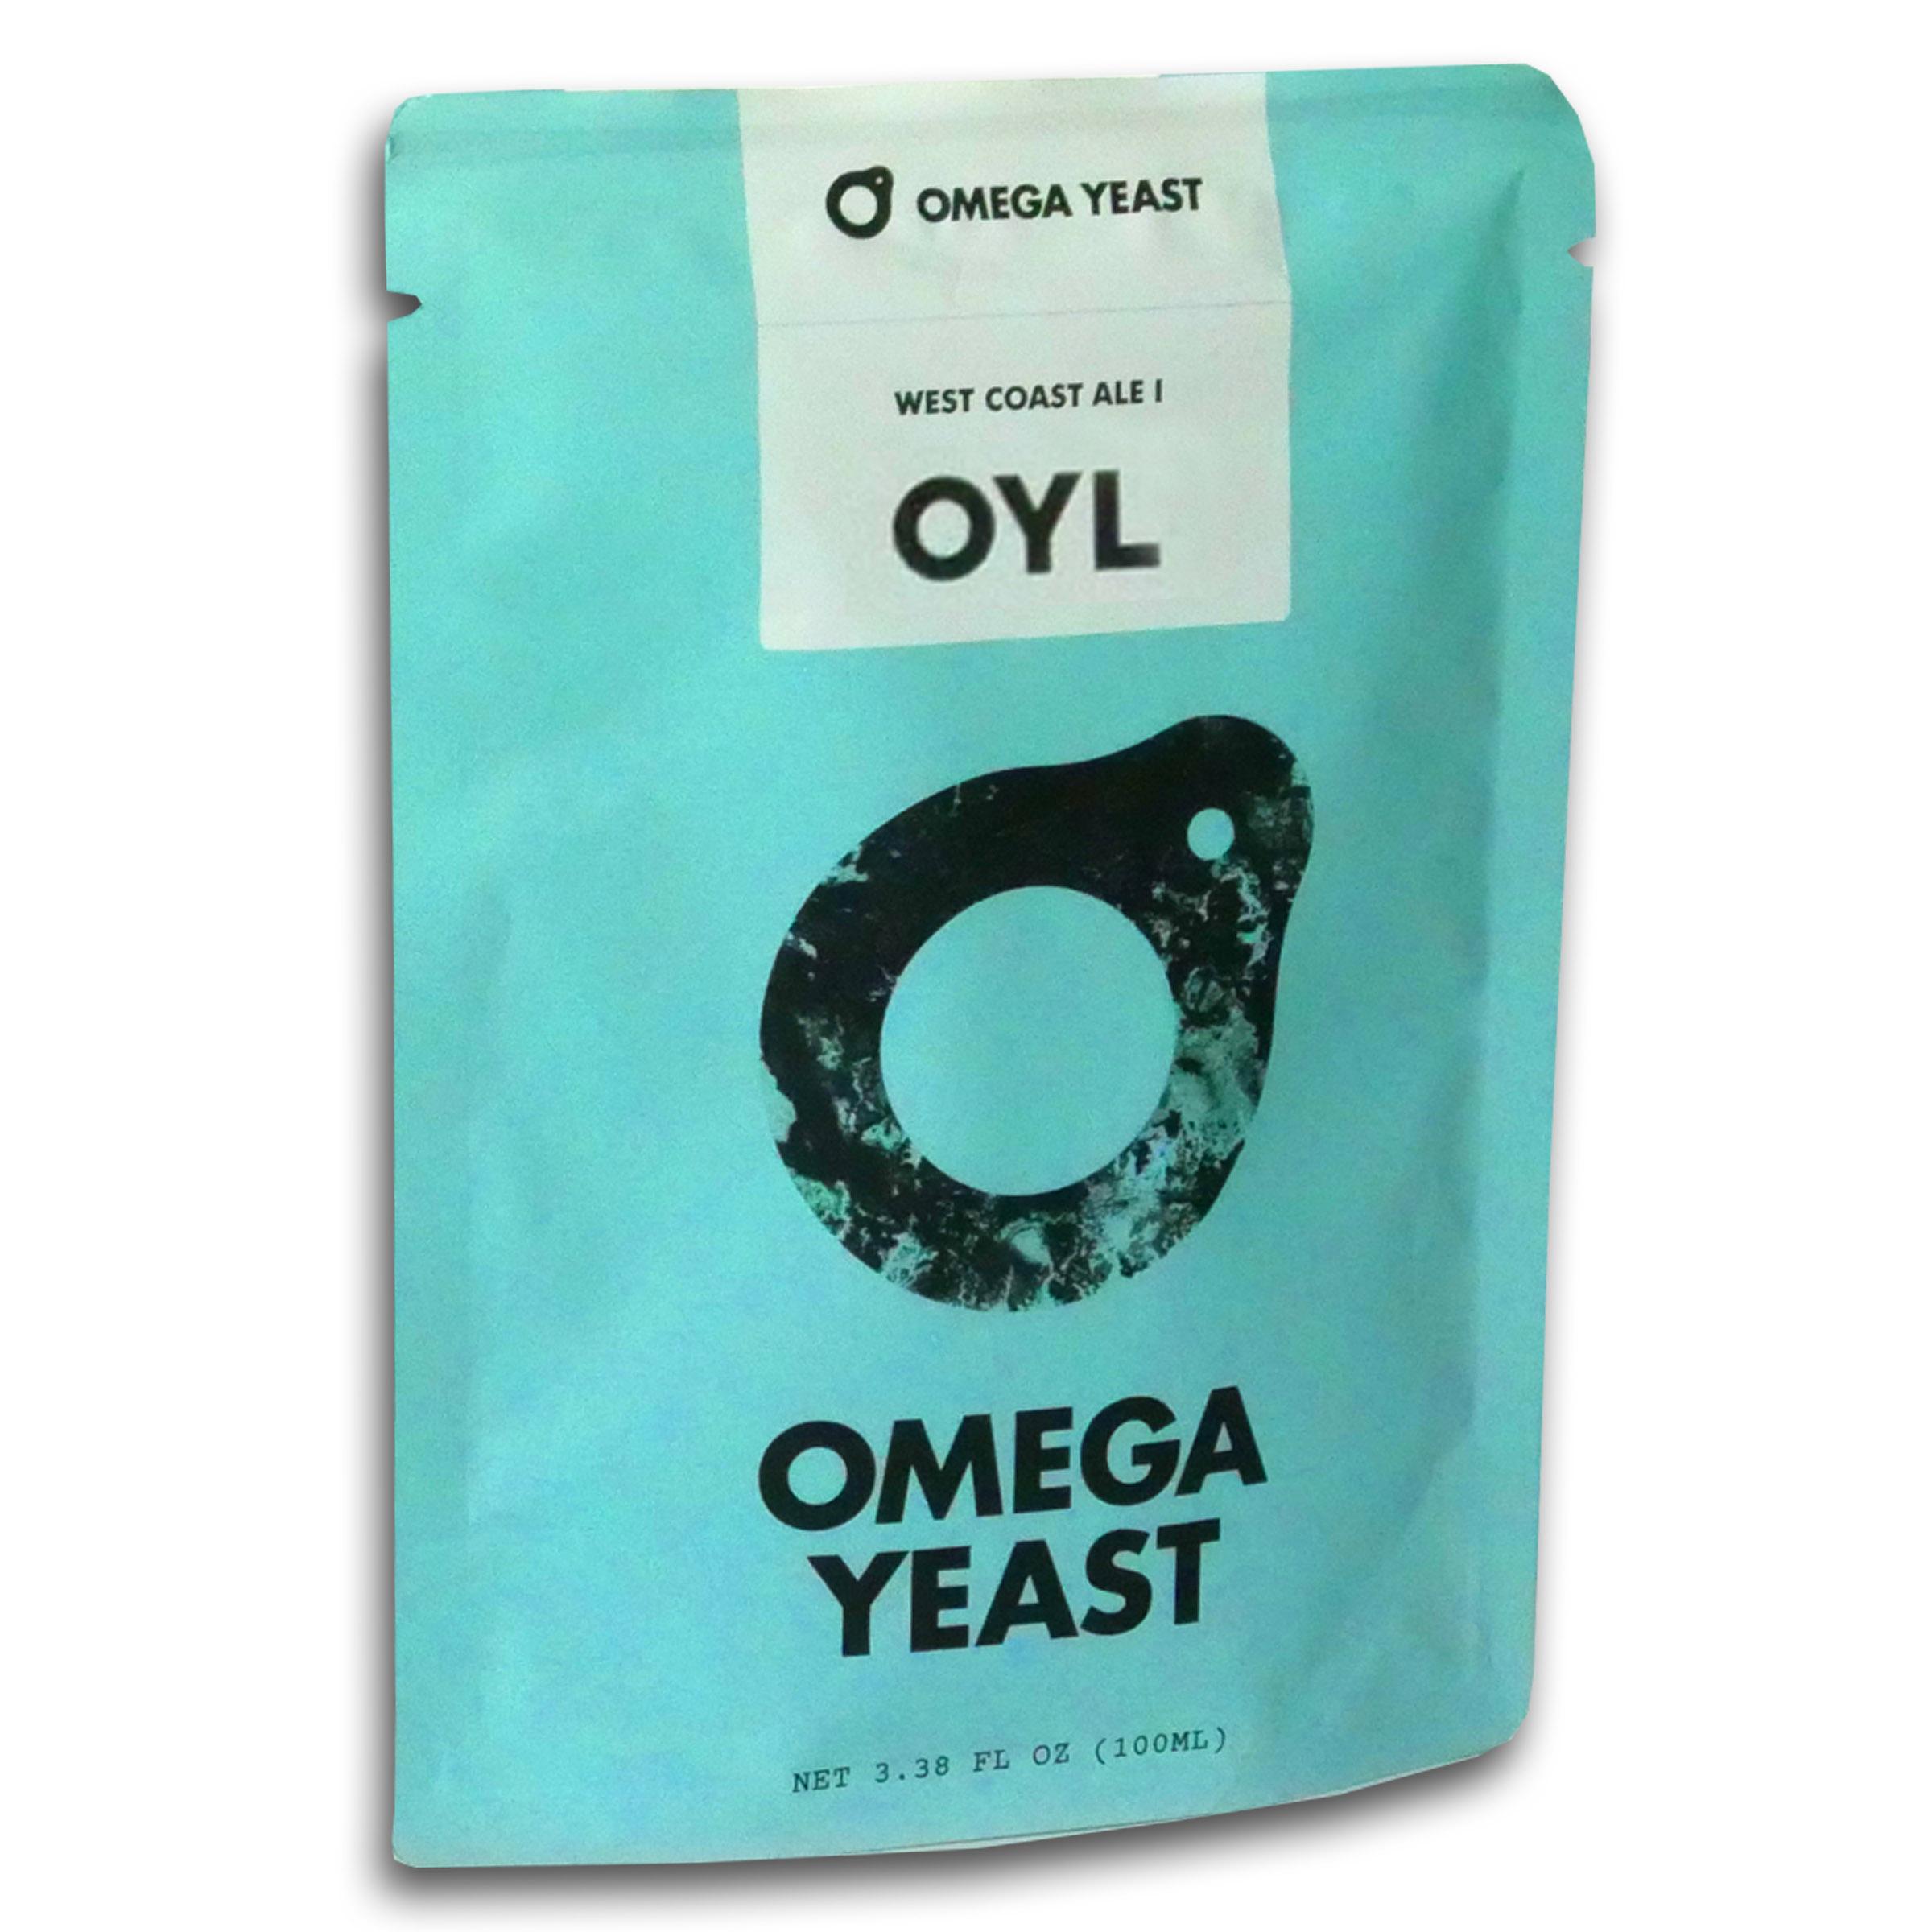 Omega Beer Yeast, Saisonstein's Monster, 500-0